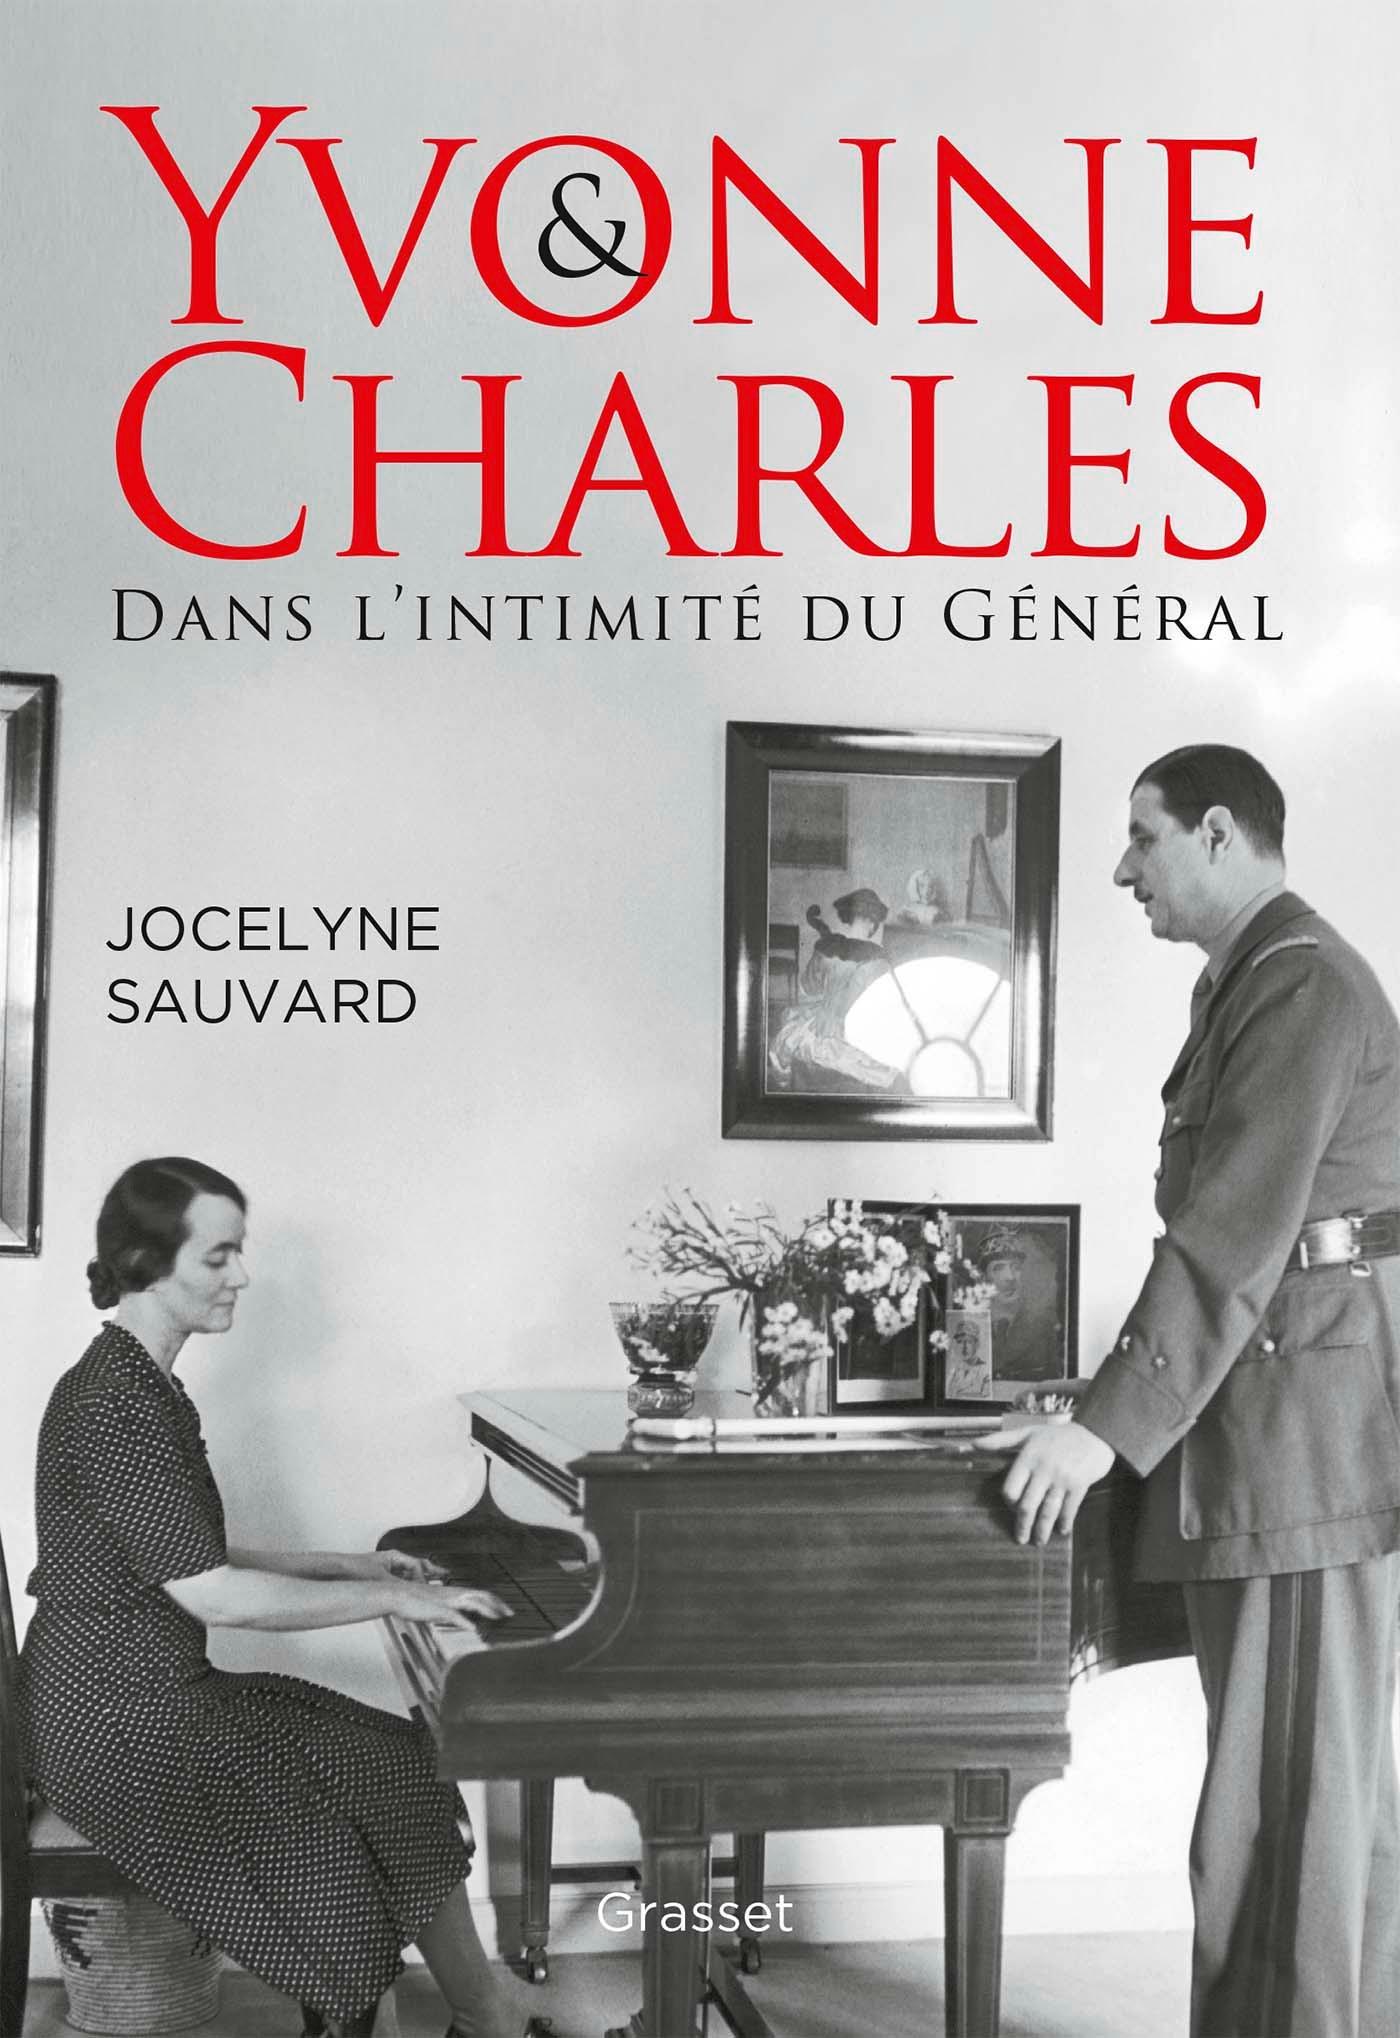 Yvonne et Charles